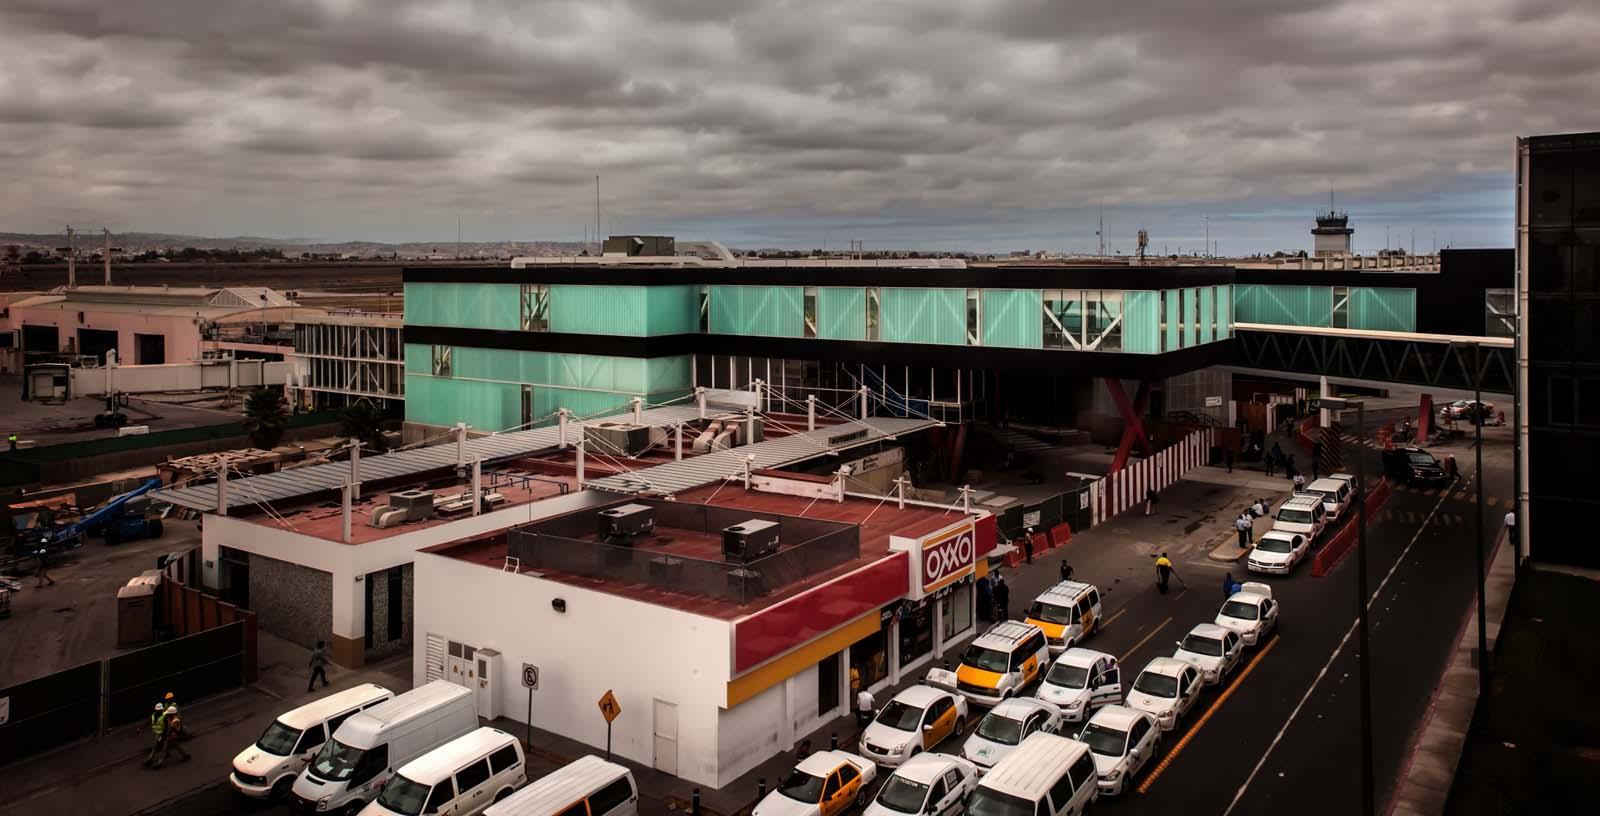 Cross-border_at_Tijuana_airport_01_Architecture_IDOM_photos_Pradip_J._Phanse